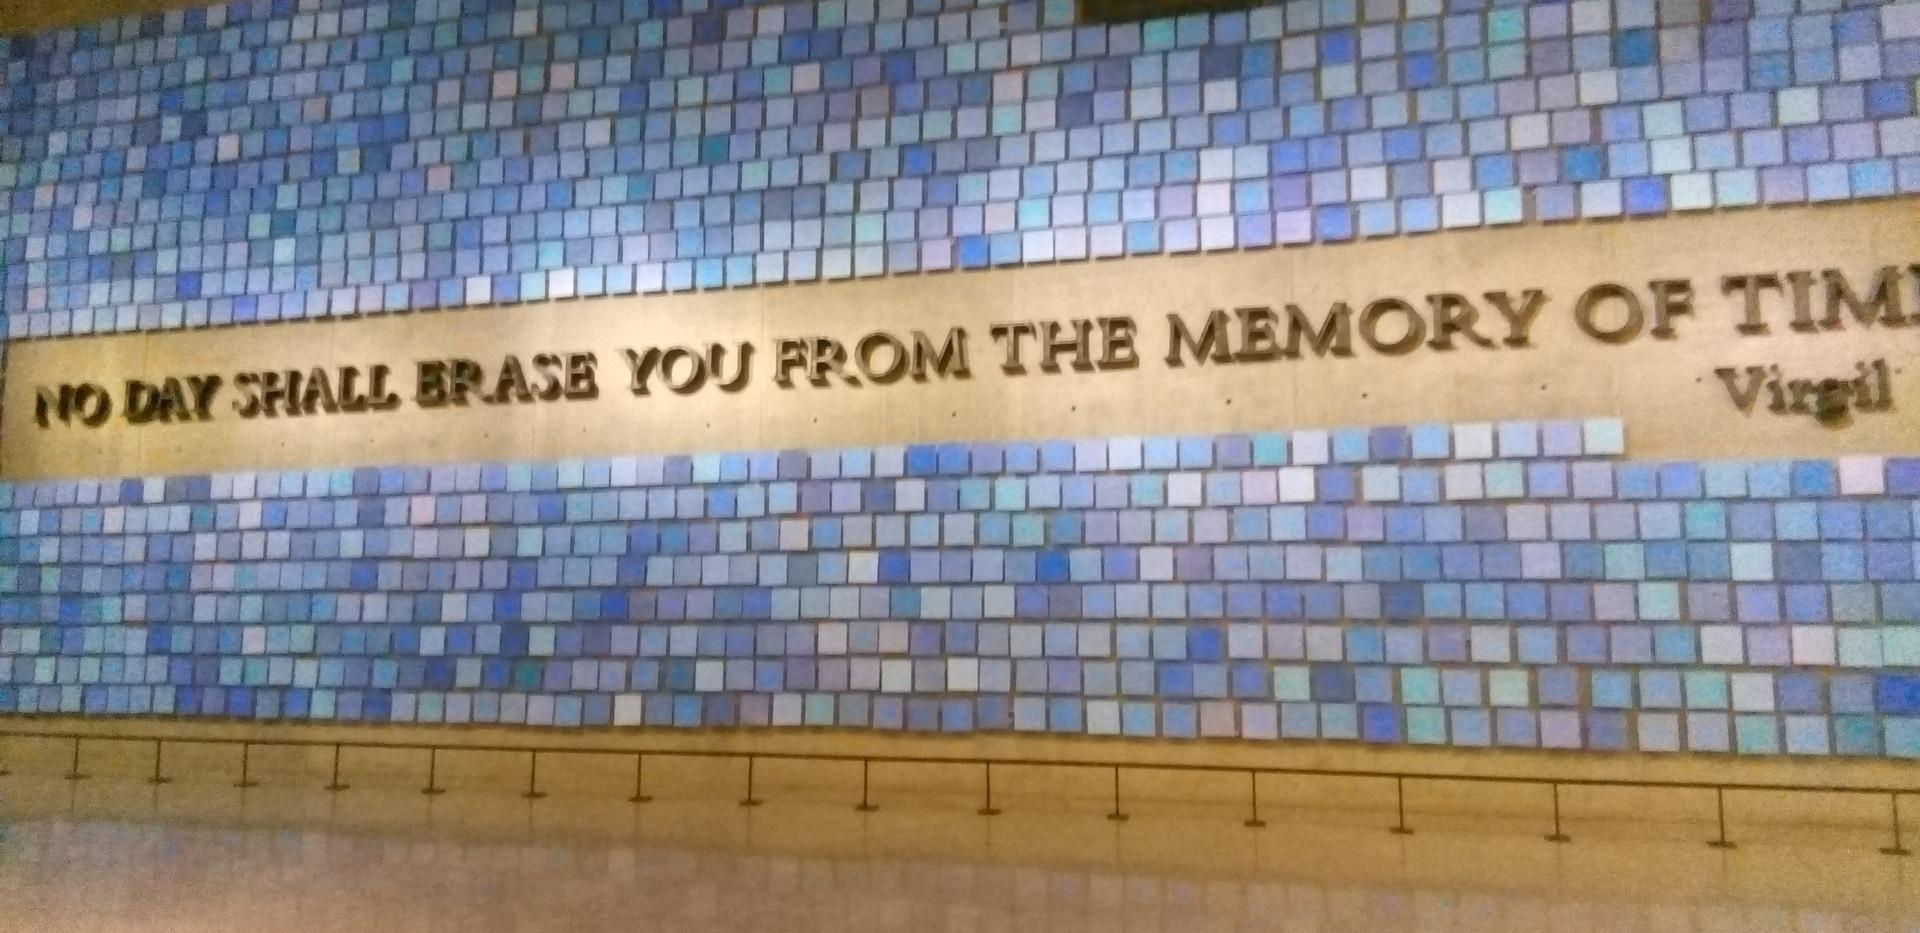 Memorial Entry